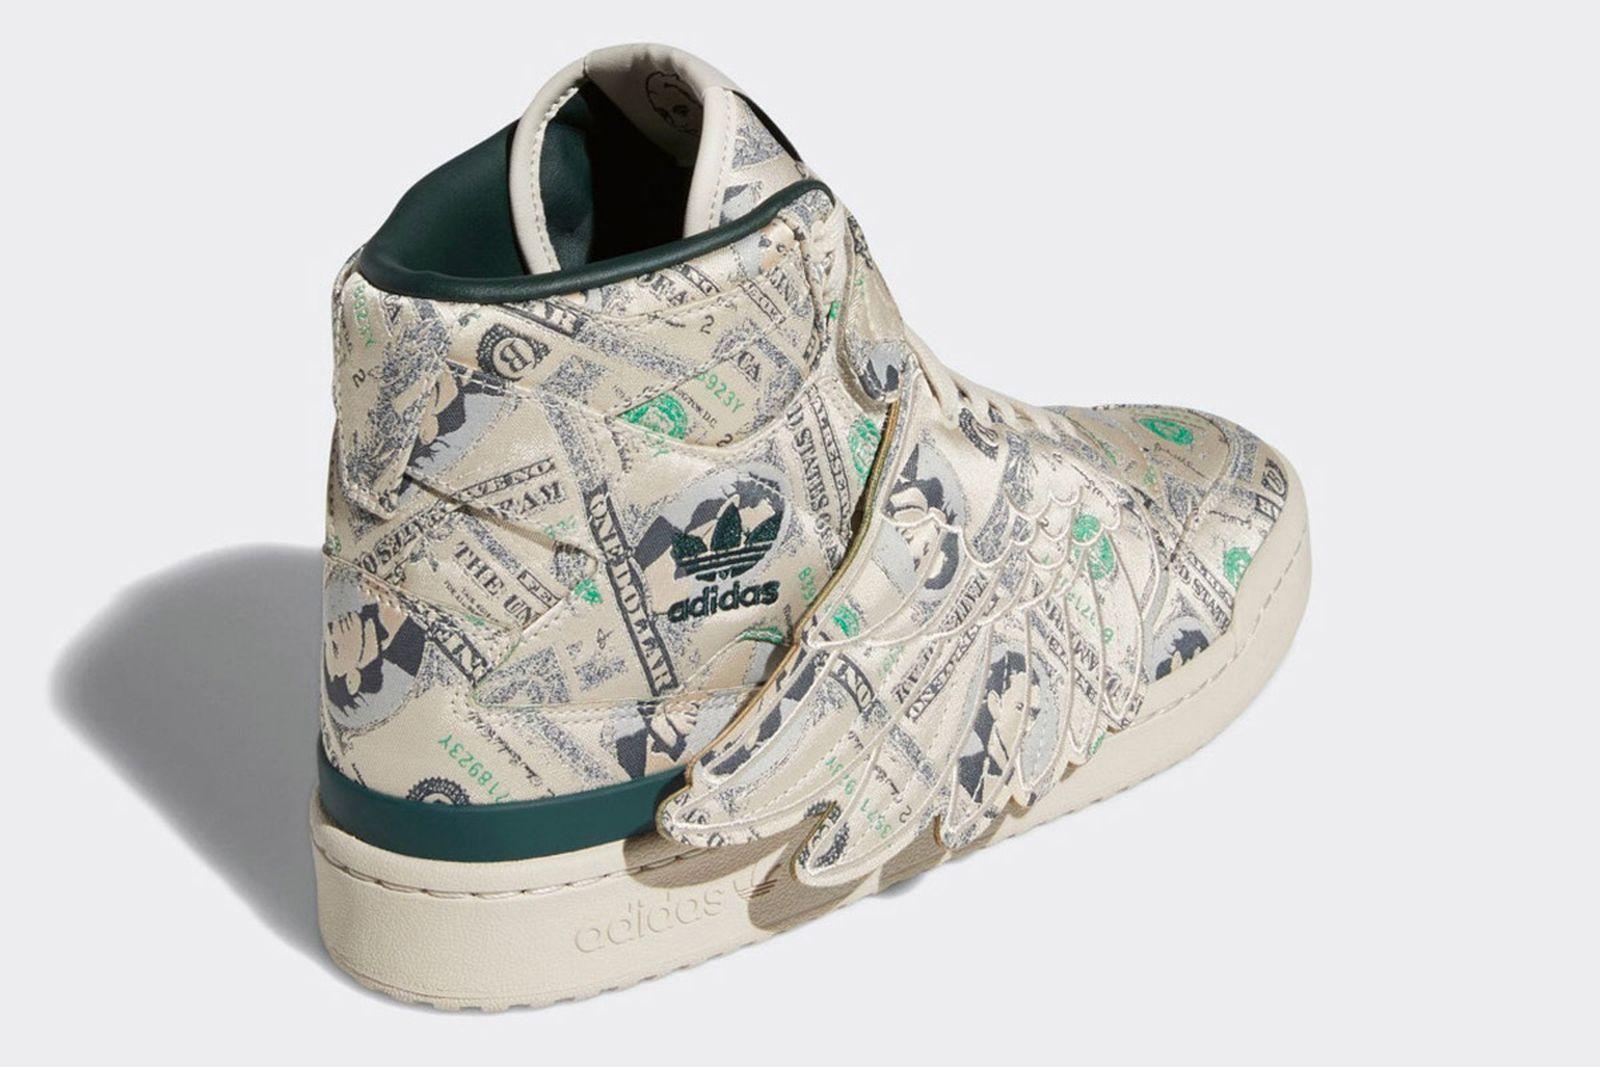 jeremy-scott-adidas-collaboration-return-06